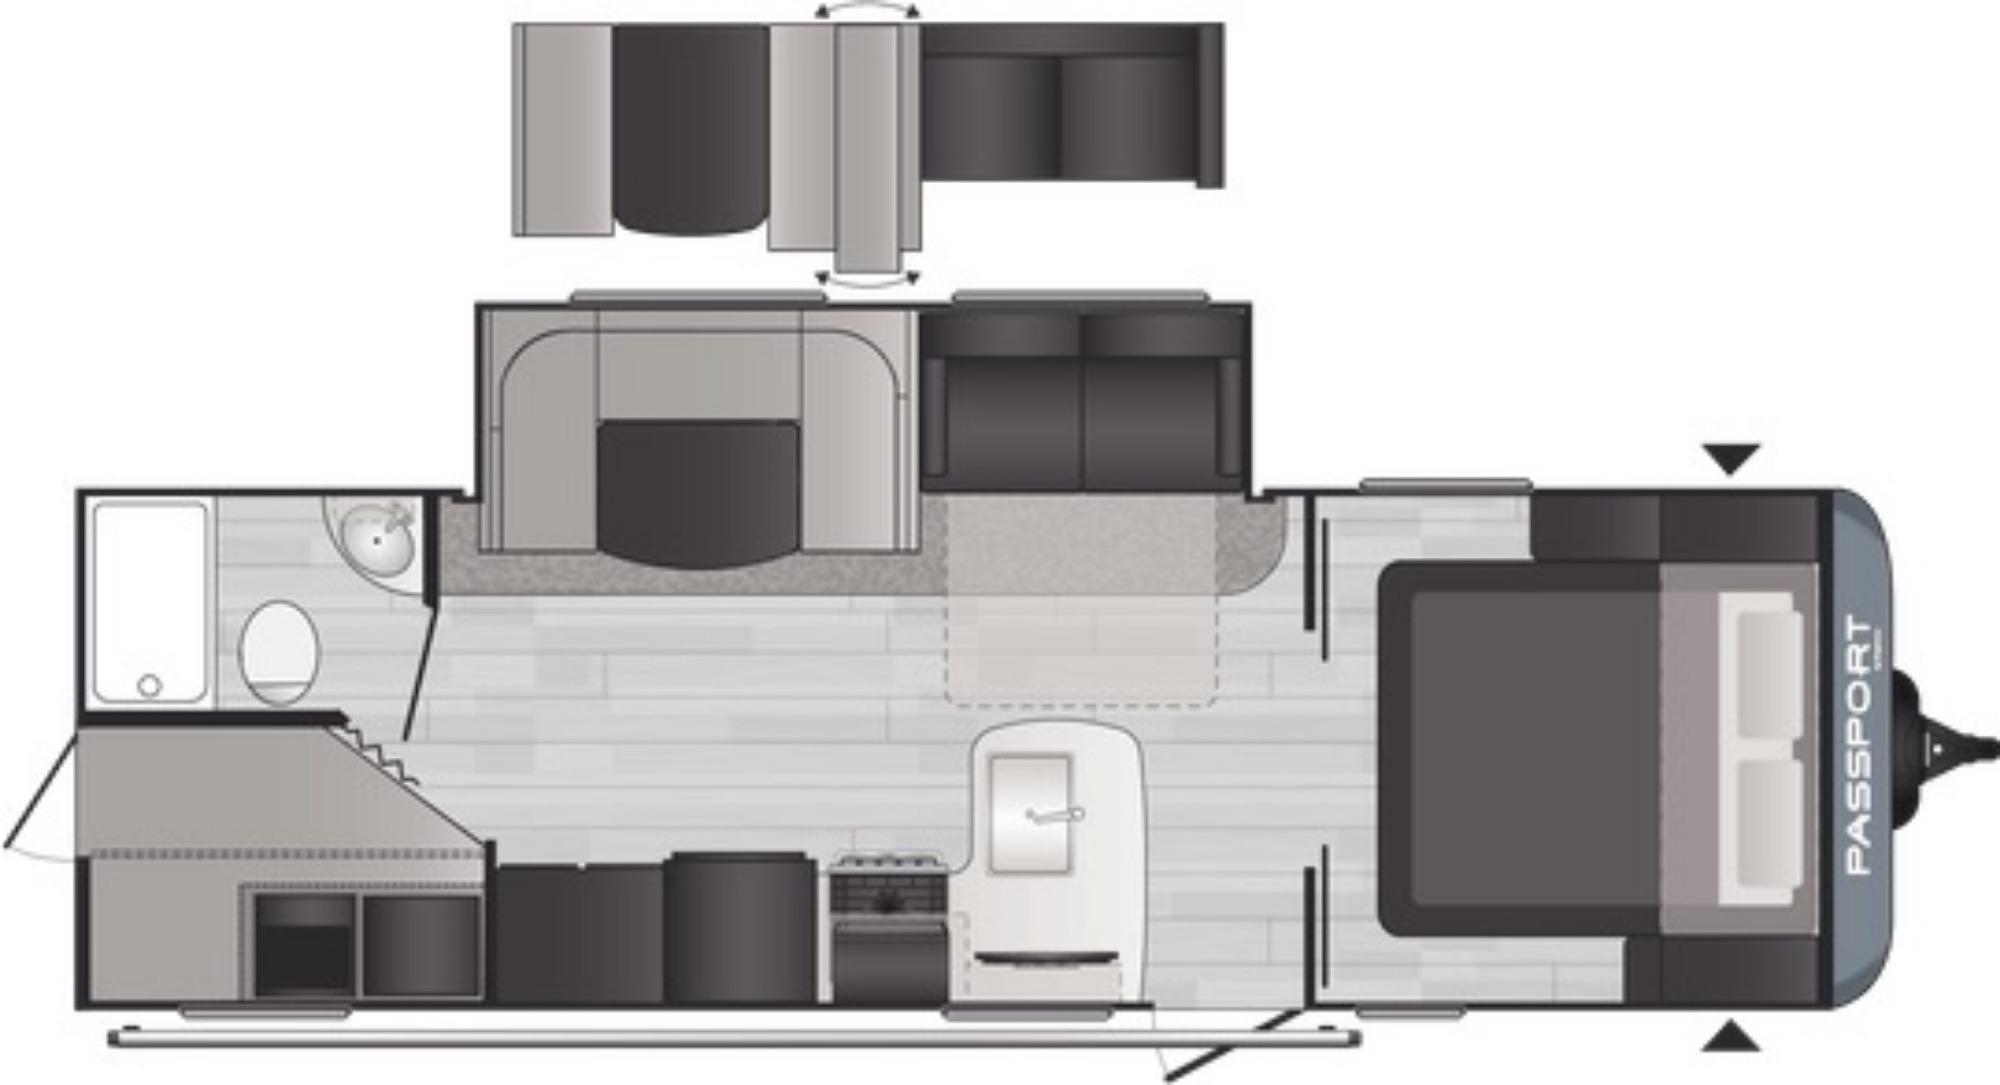 View Floor Plan for 2021 KEYSTONE PASSPORT 268BHWE